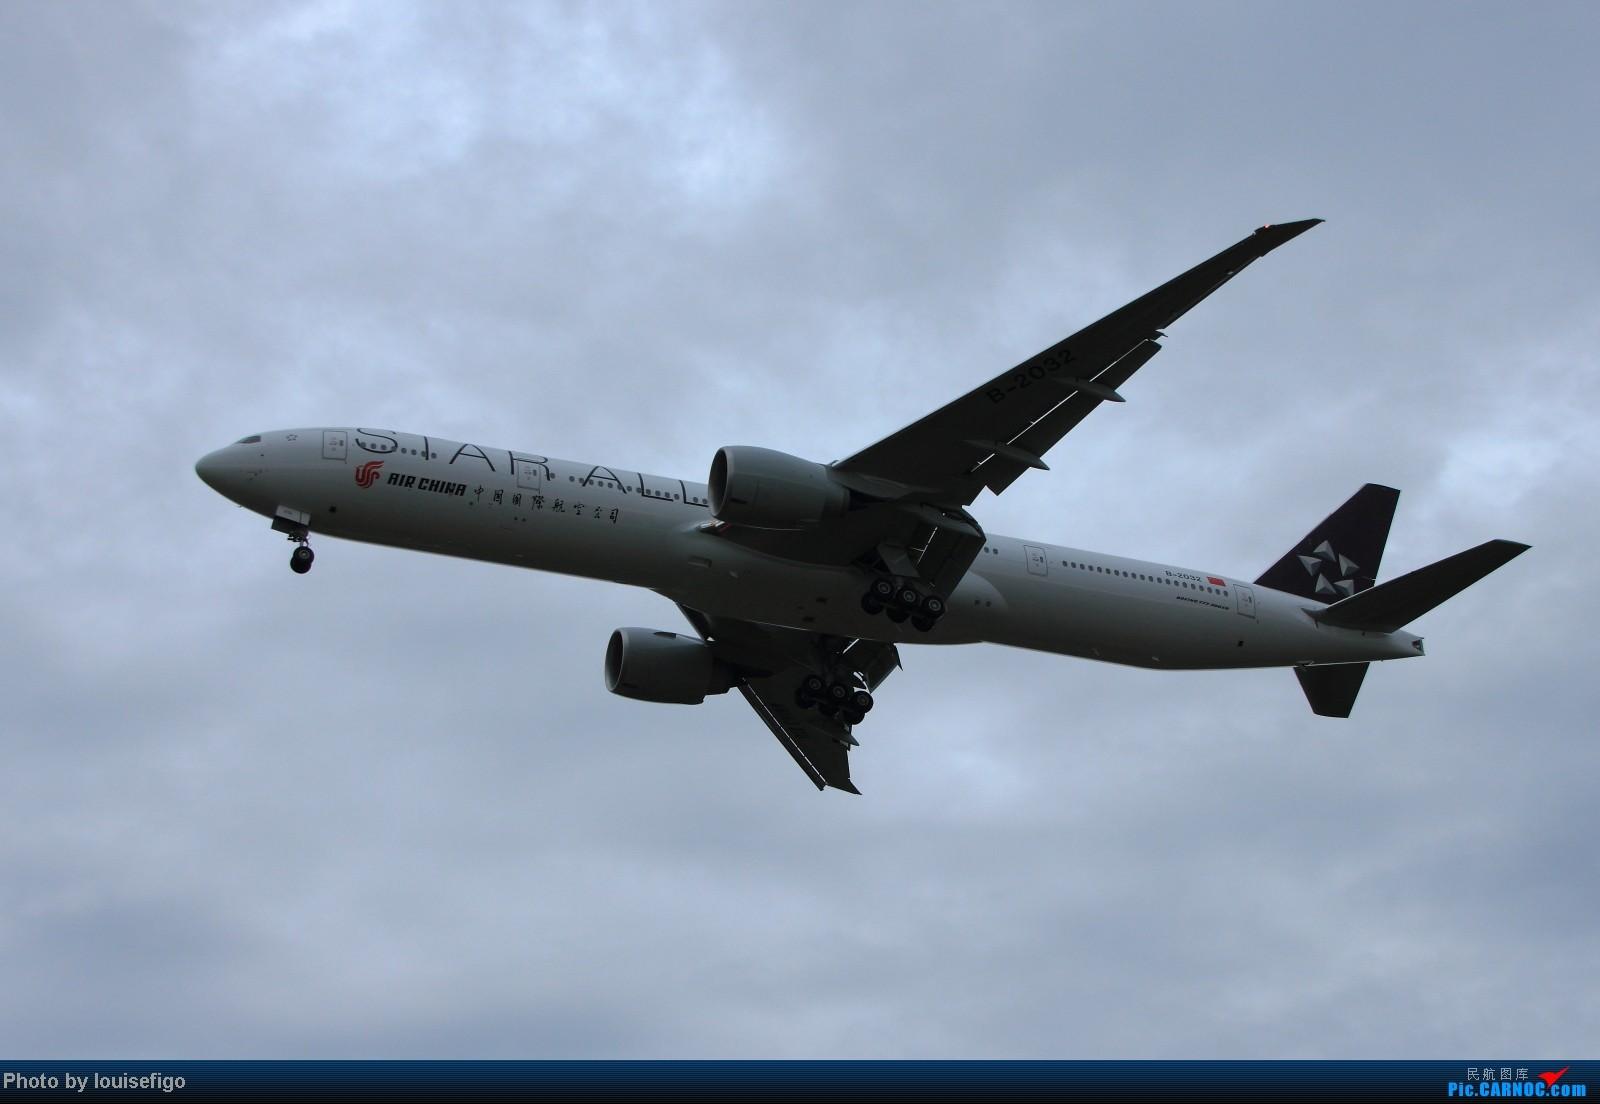 Re:[原创]B-2032!雨过天不晴,小鸟似精灵。归家第一闪,大家齐欢迎!   :)   欢迎国航首架星空联盟大猩猩涂装B77W回家! BOEING 777-300ER B-2032 北京首都国际机场